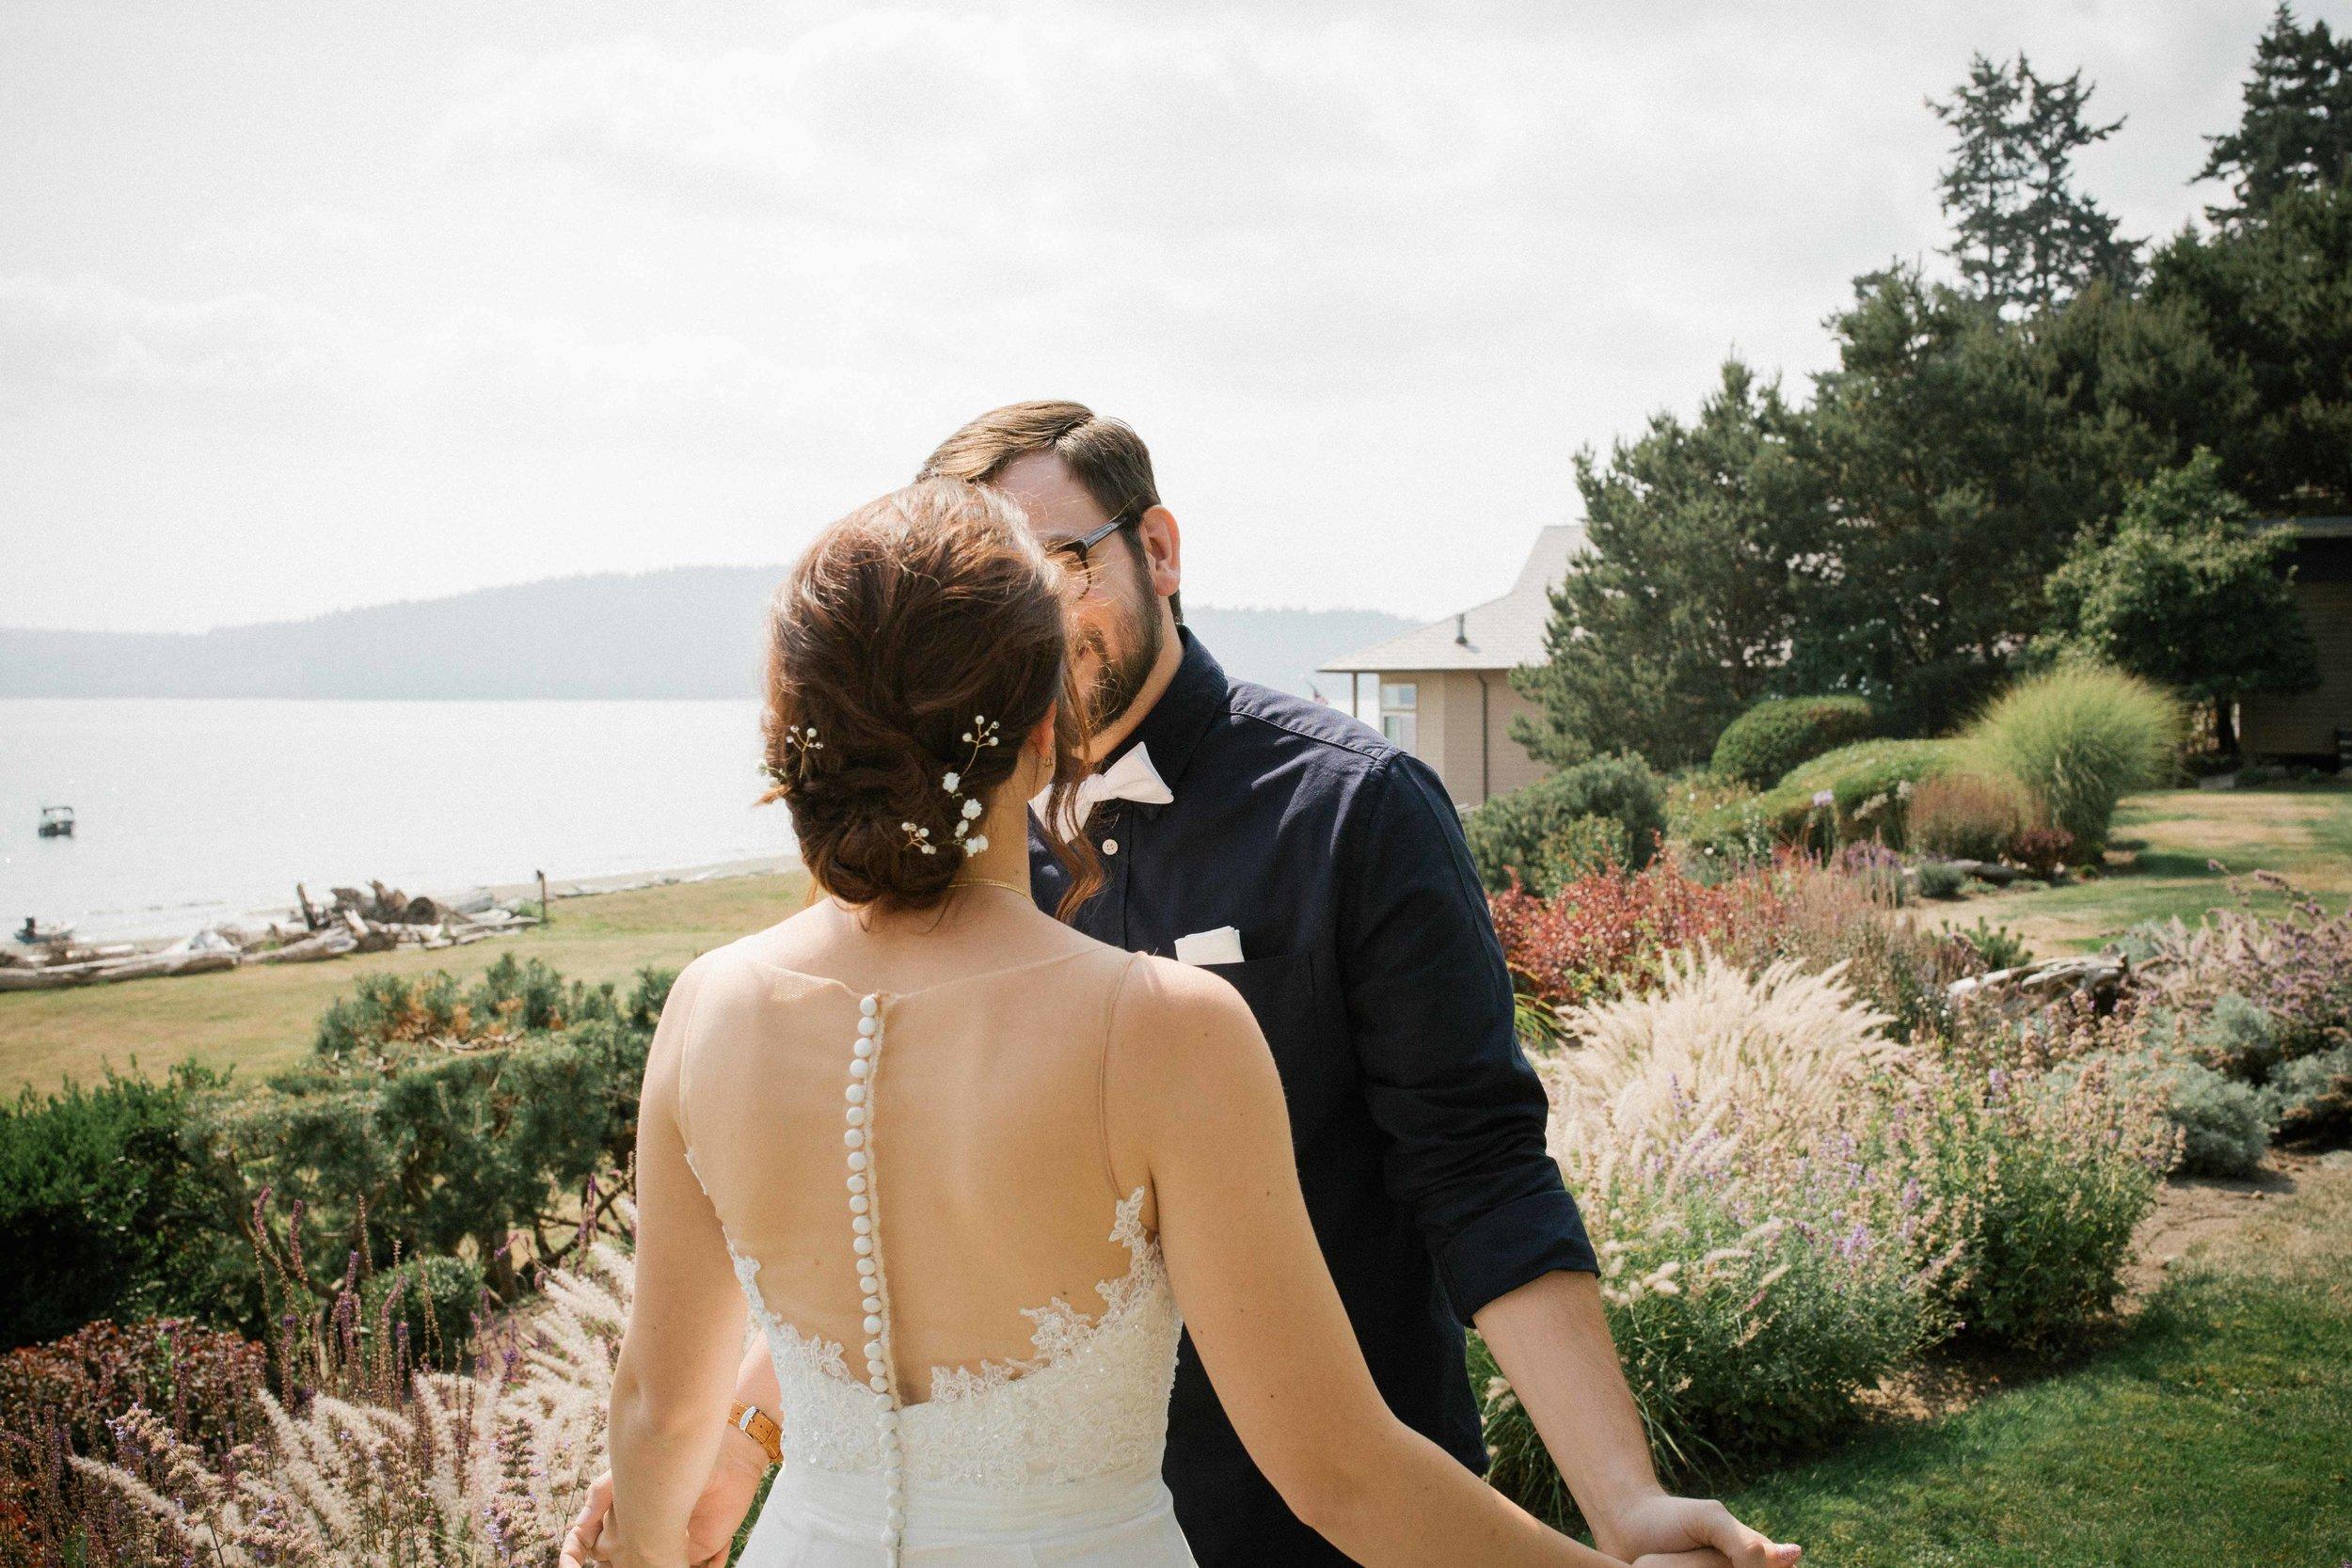 deception-pass-wedding-19.jpg